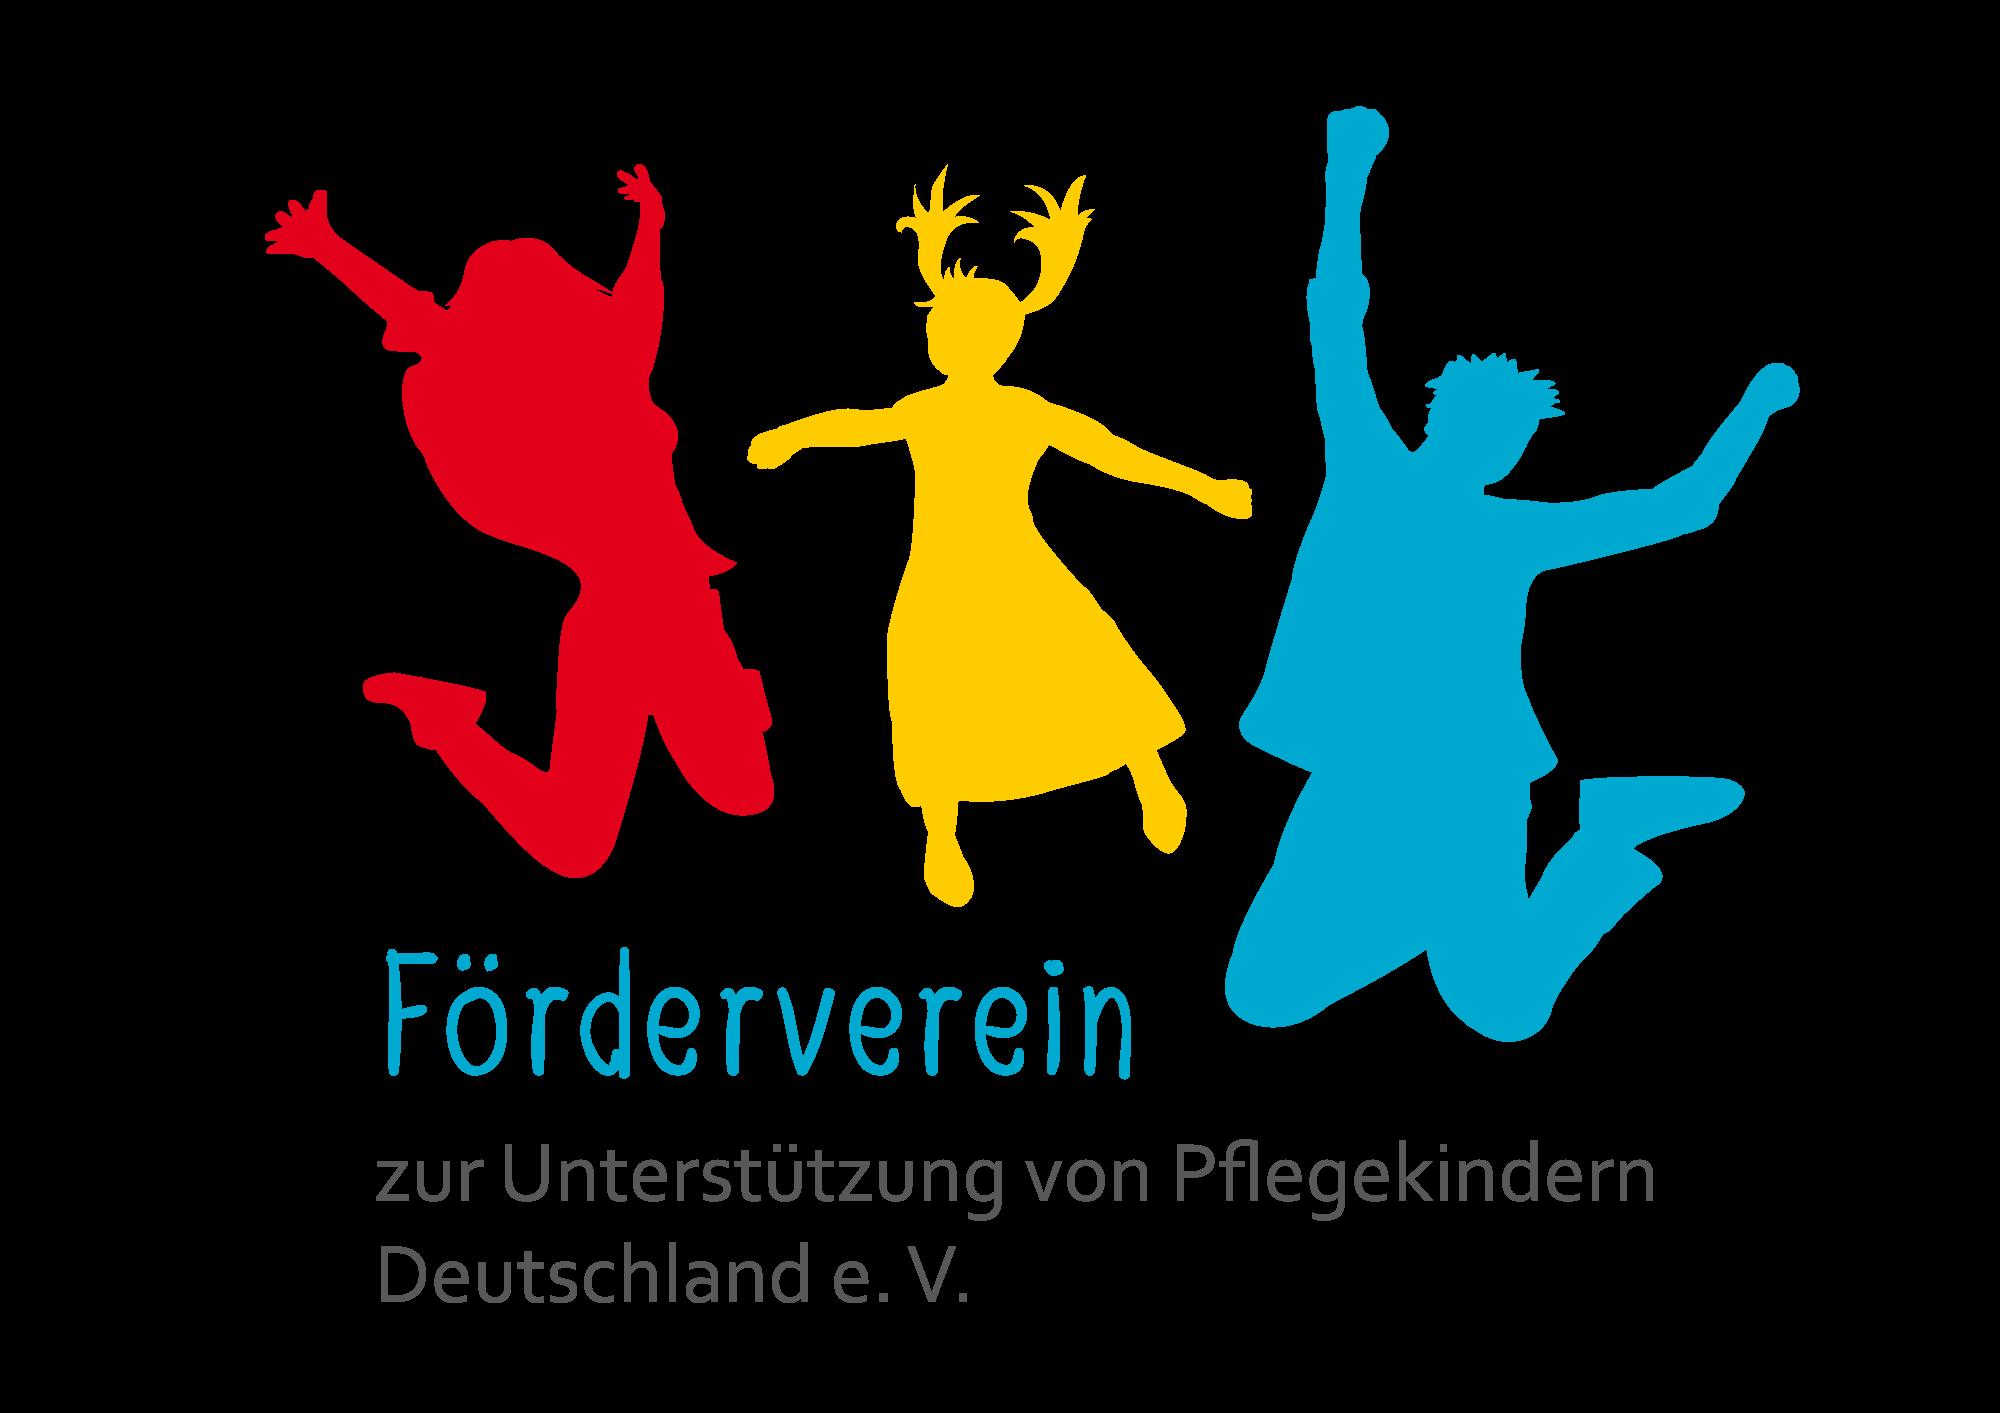 www.foerderverein-pflegekinder-deutschland.de